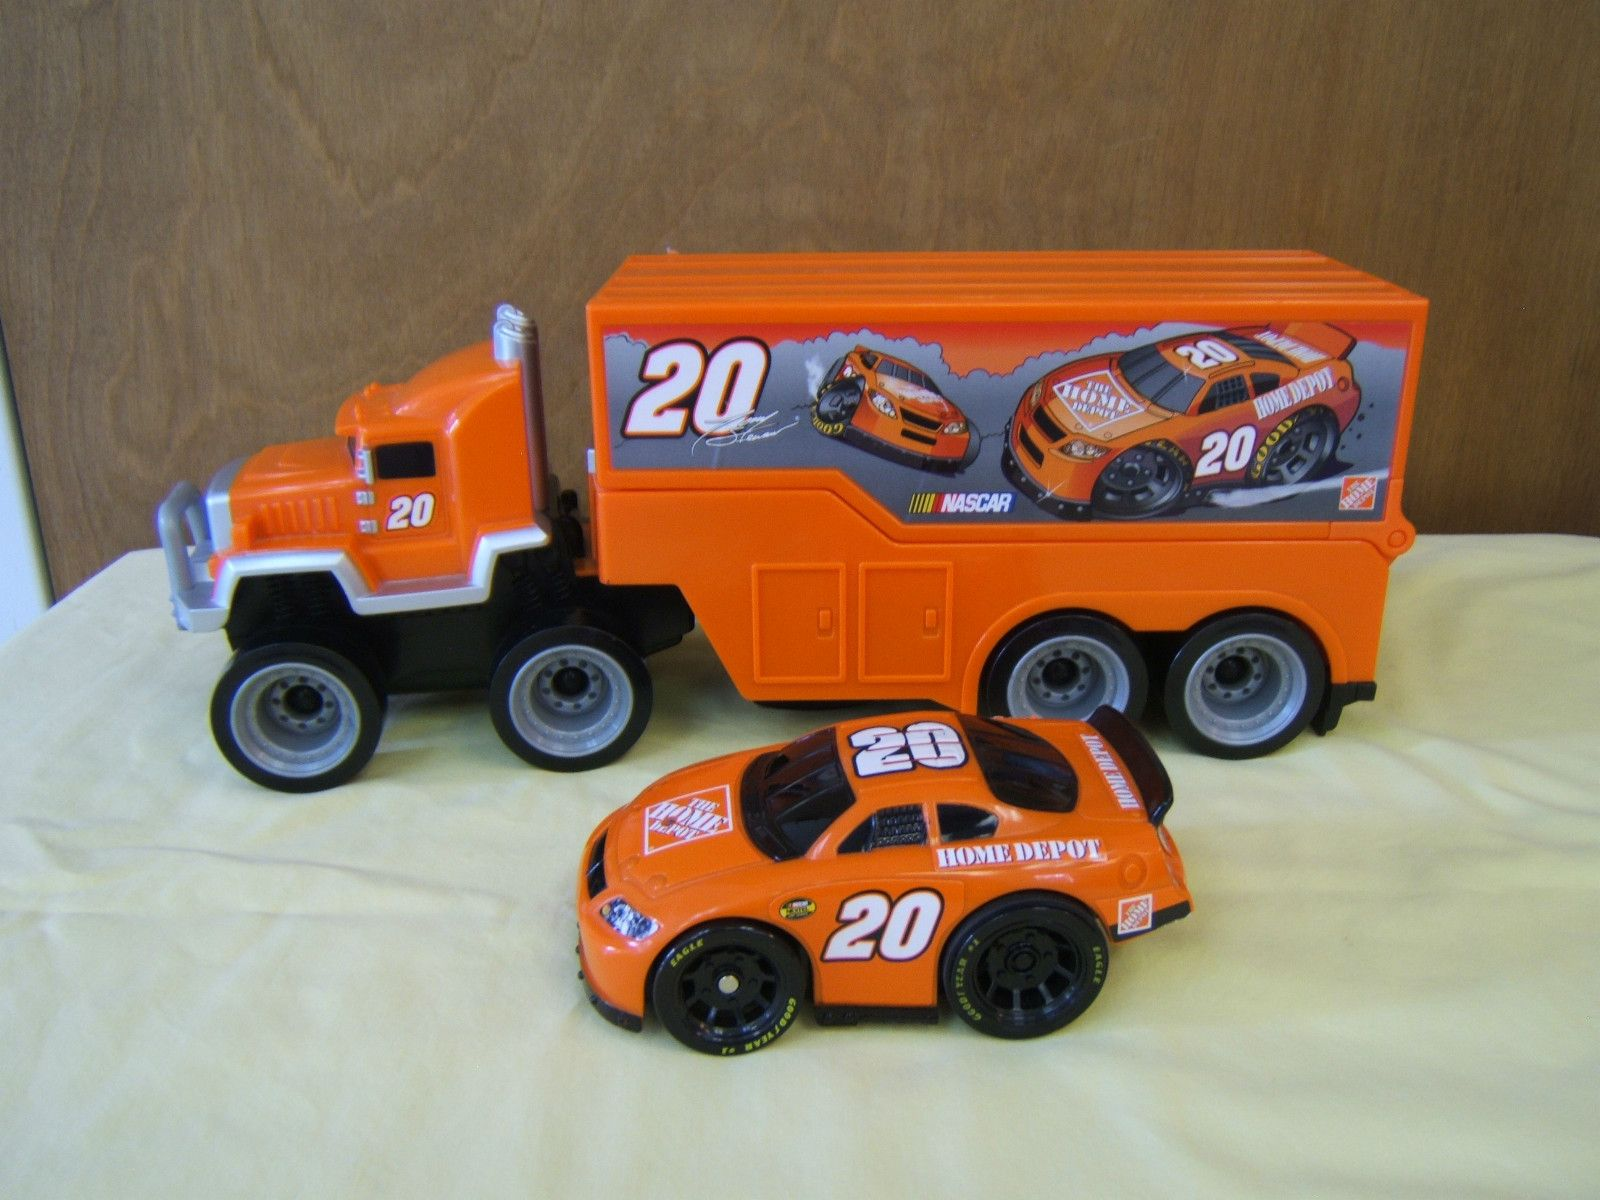 Mattel Nascar 16 Semi Truck Hauler With Race Car Home Depot Nascar Collectibles Toy Car Semi Trucks